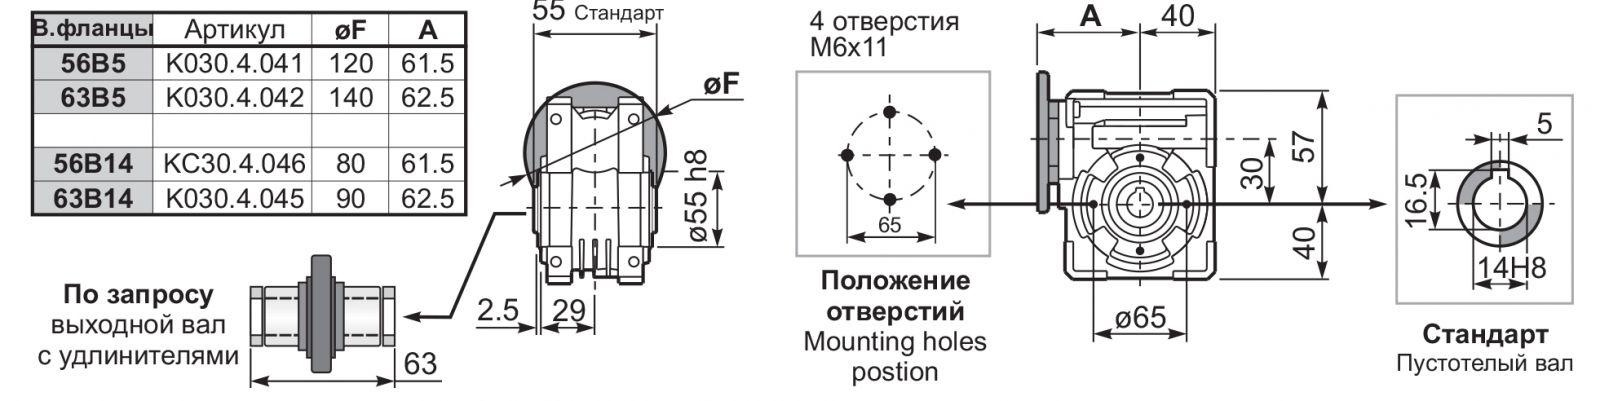 Чертеж редуктора Q 30 innovari